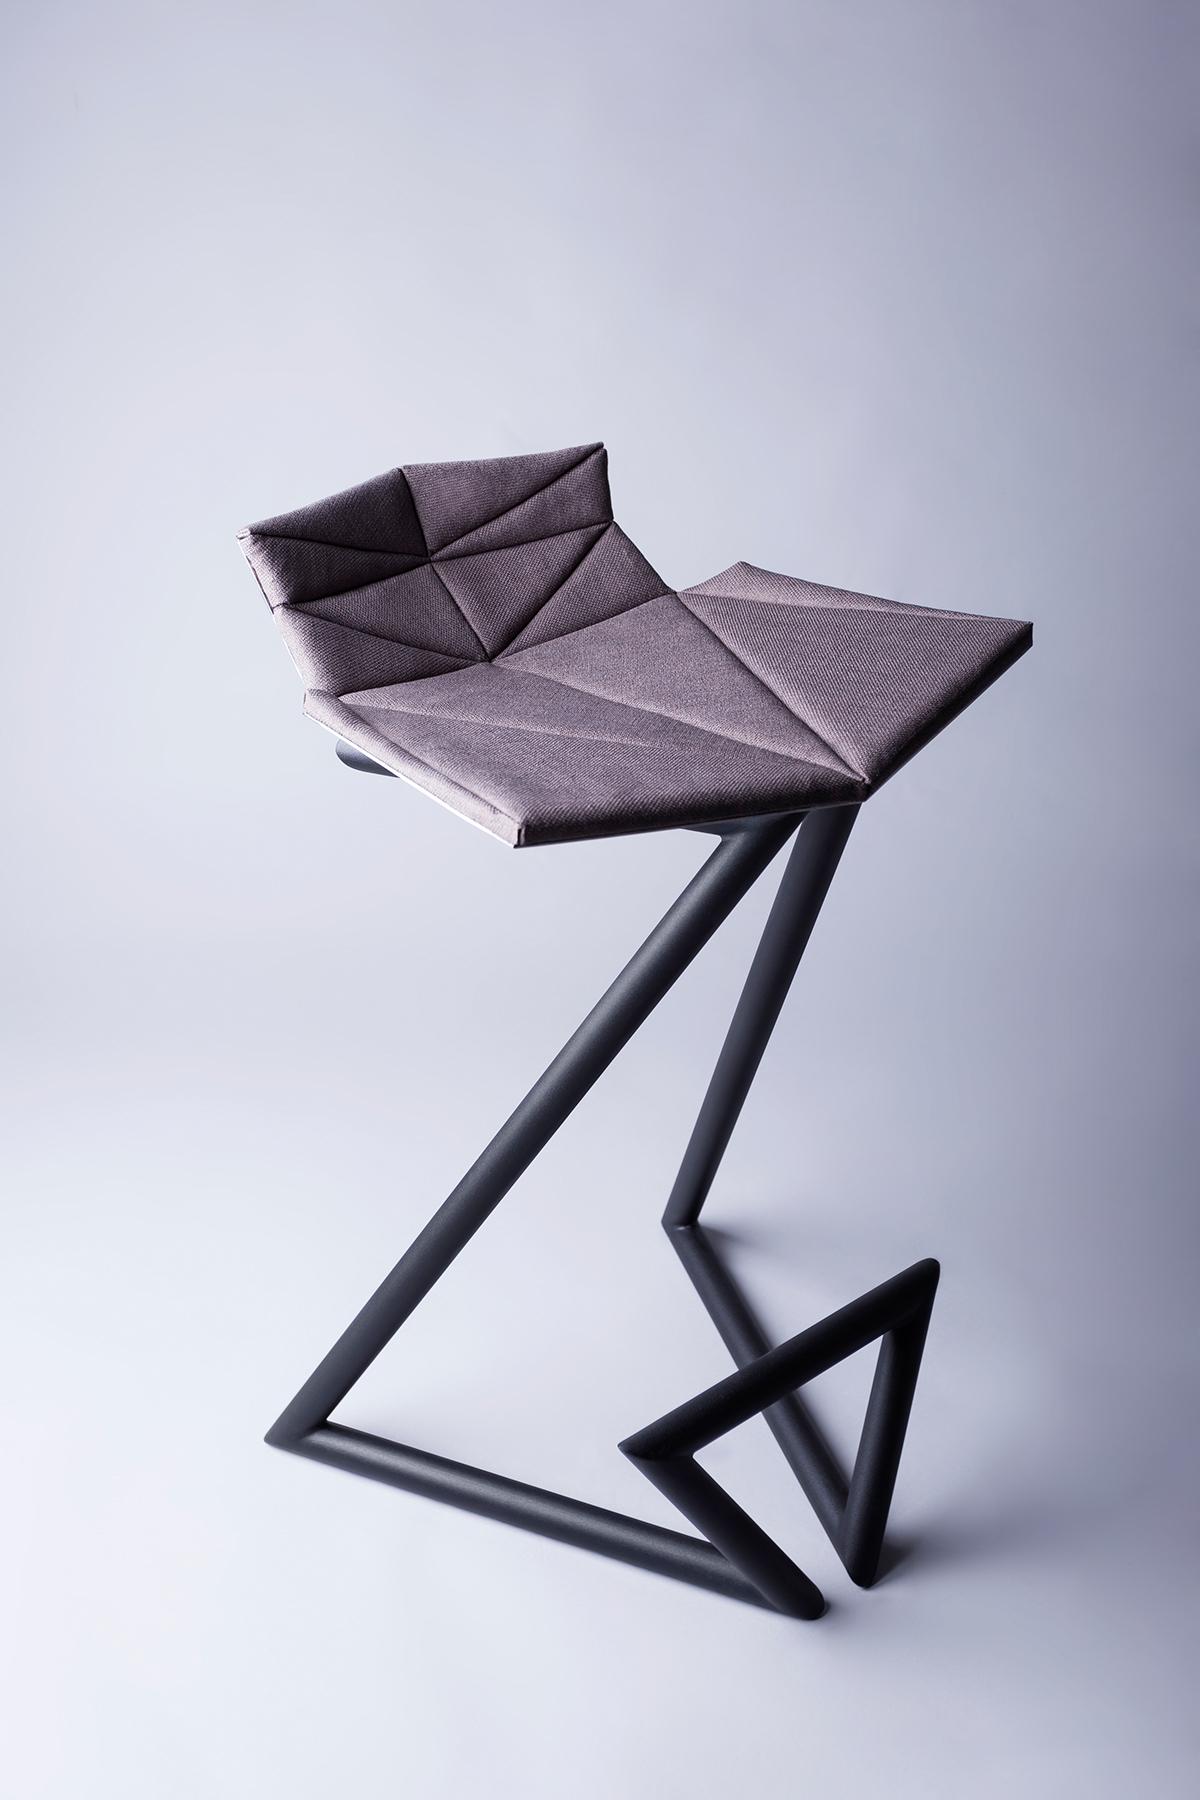 Karchman z-chair contemporary design oleksii karman ukrainian design ukraine design metall chair design chair Bar chair bar stool